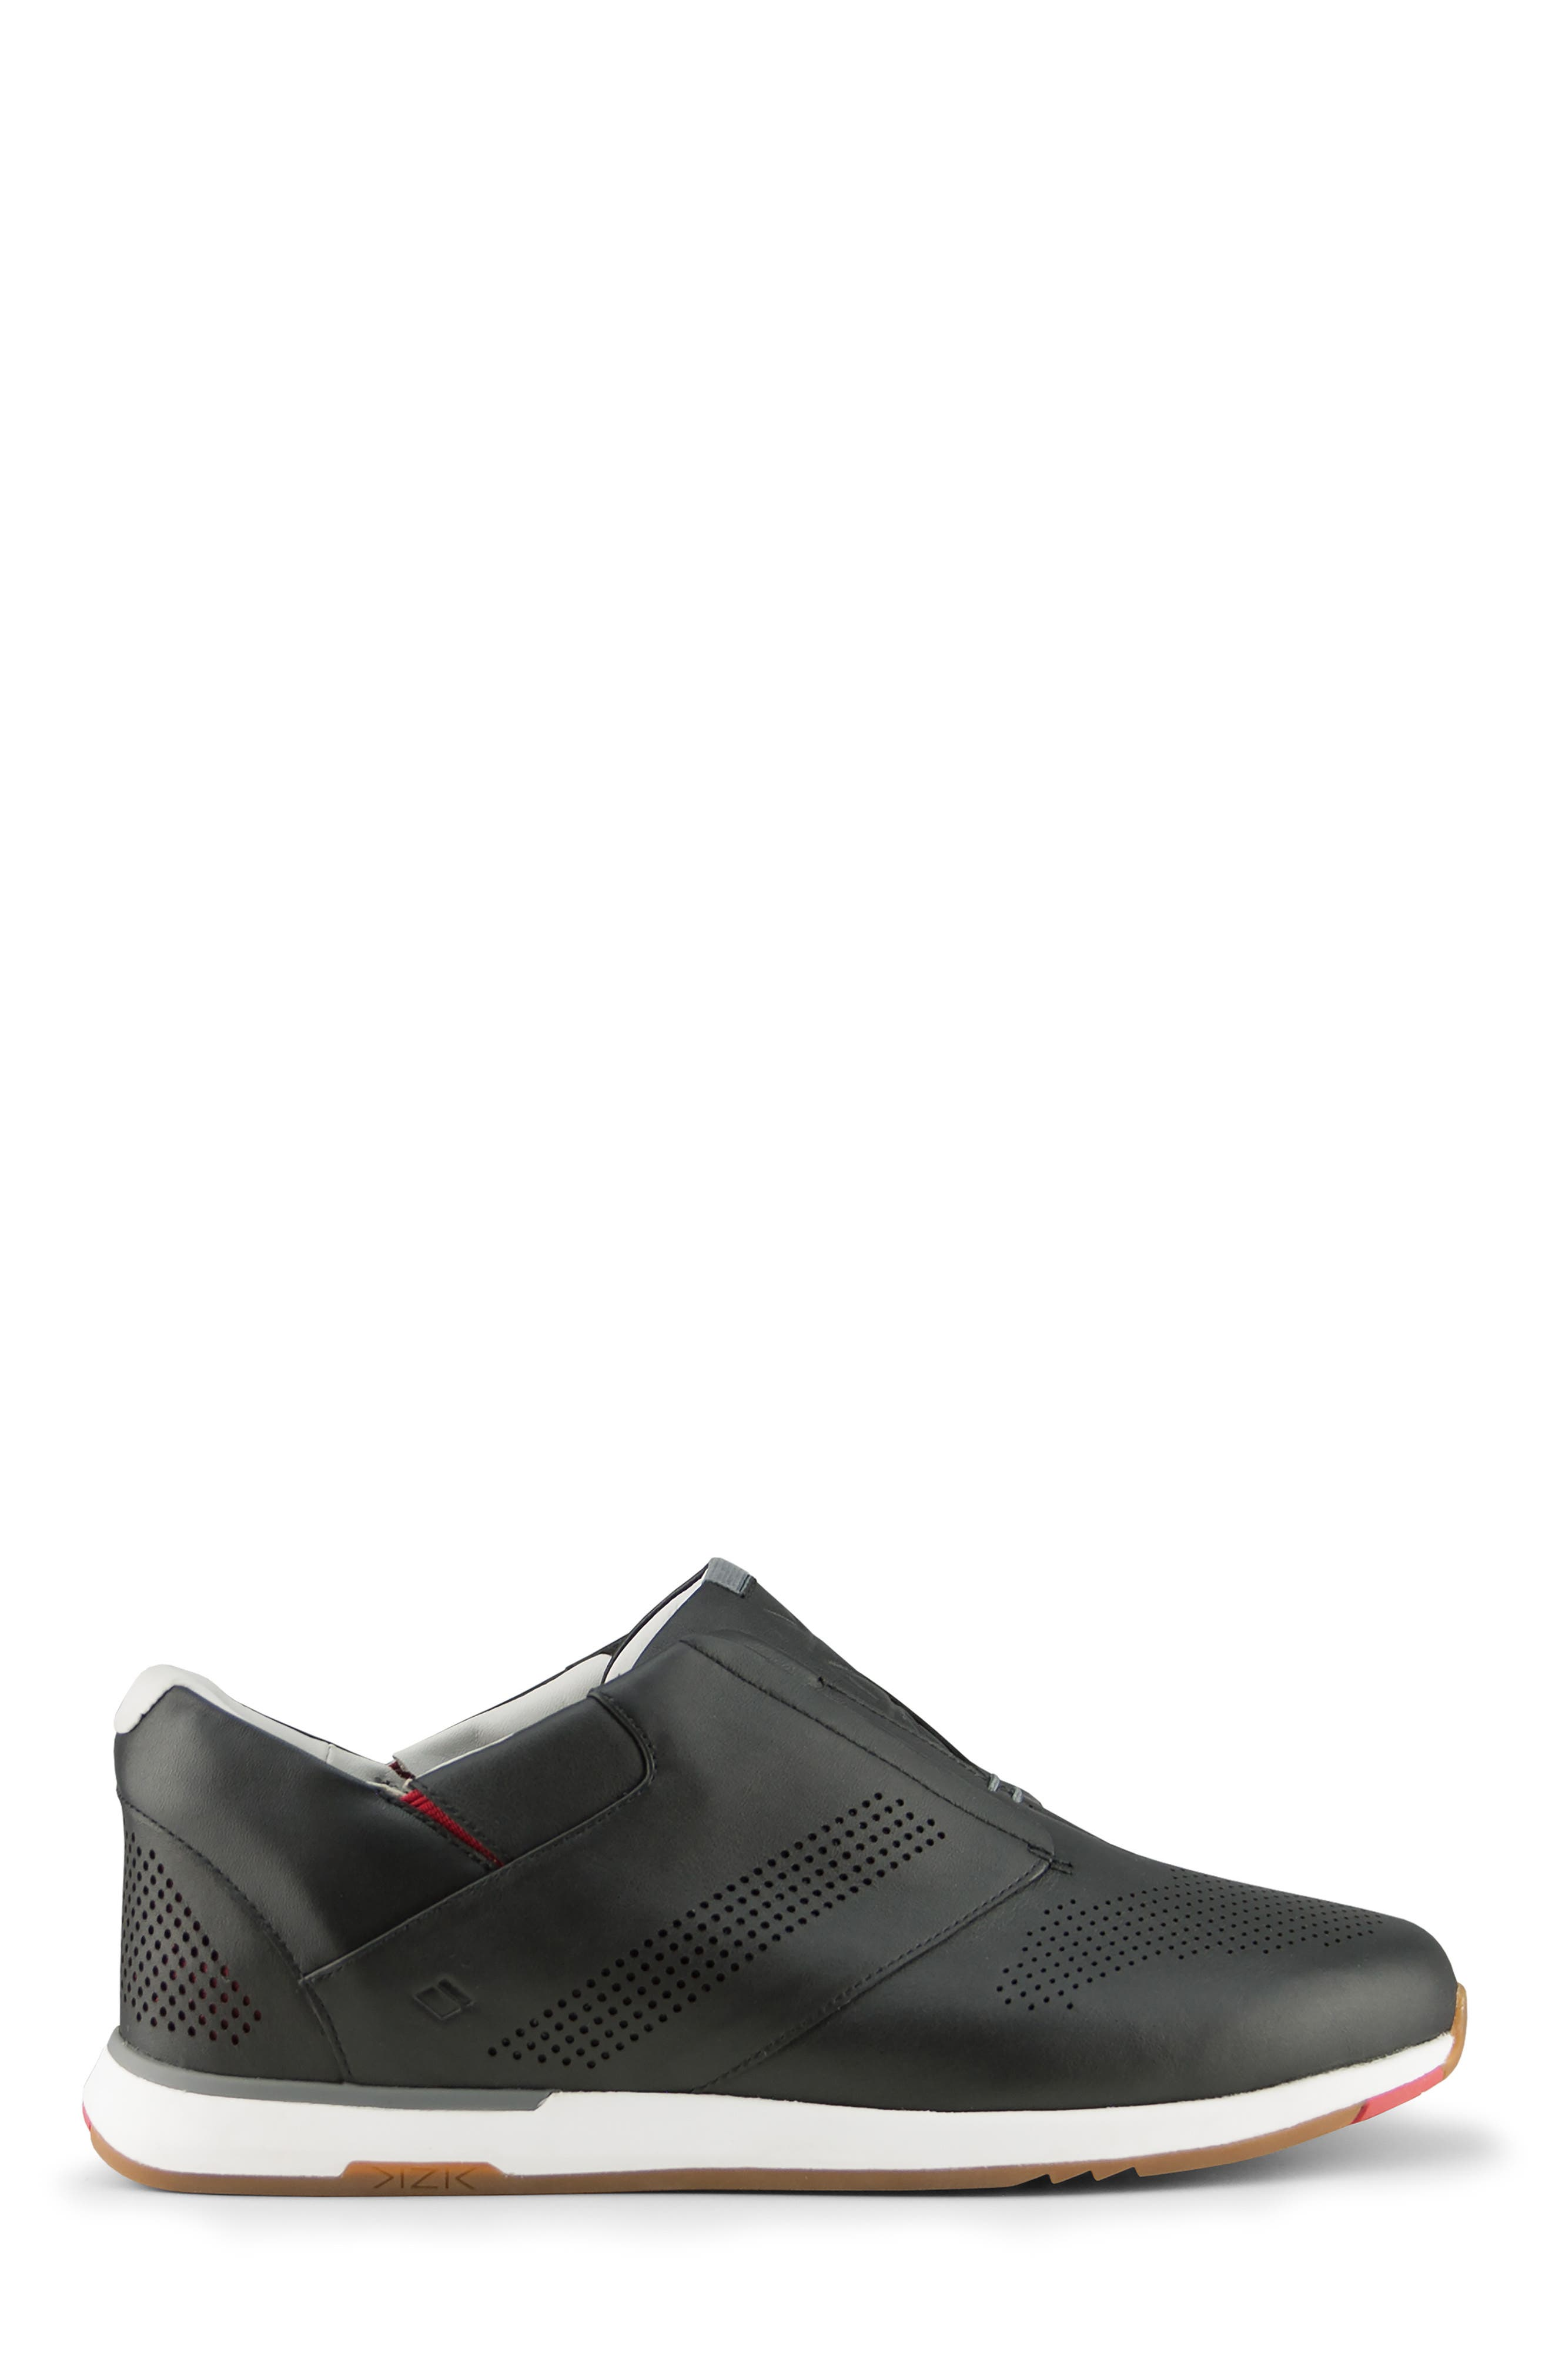 KIZIK, Dubai Slip-On Sneaker, Alternate thumbnail 2, color, BLACK LEATHER